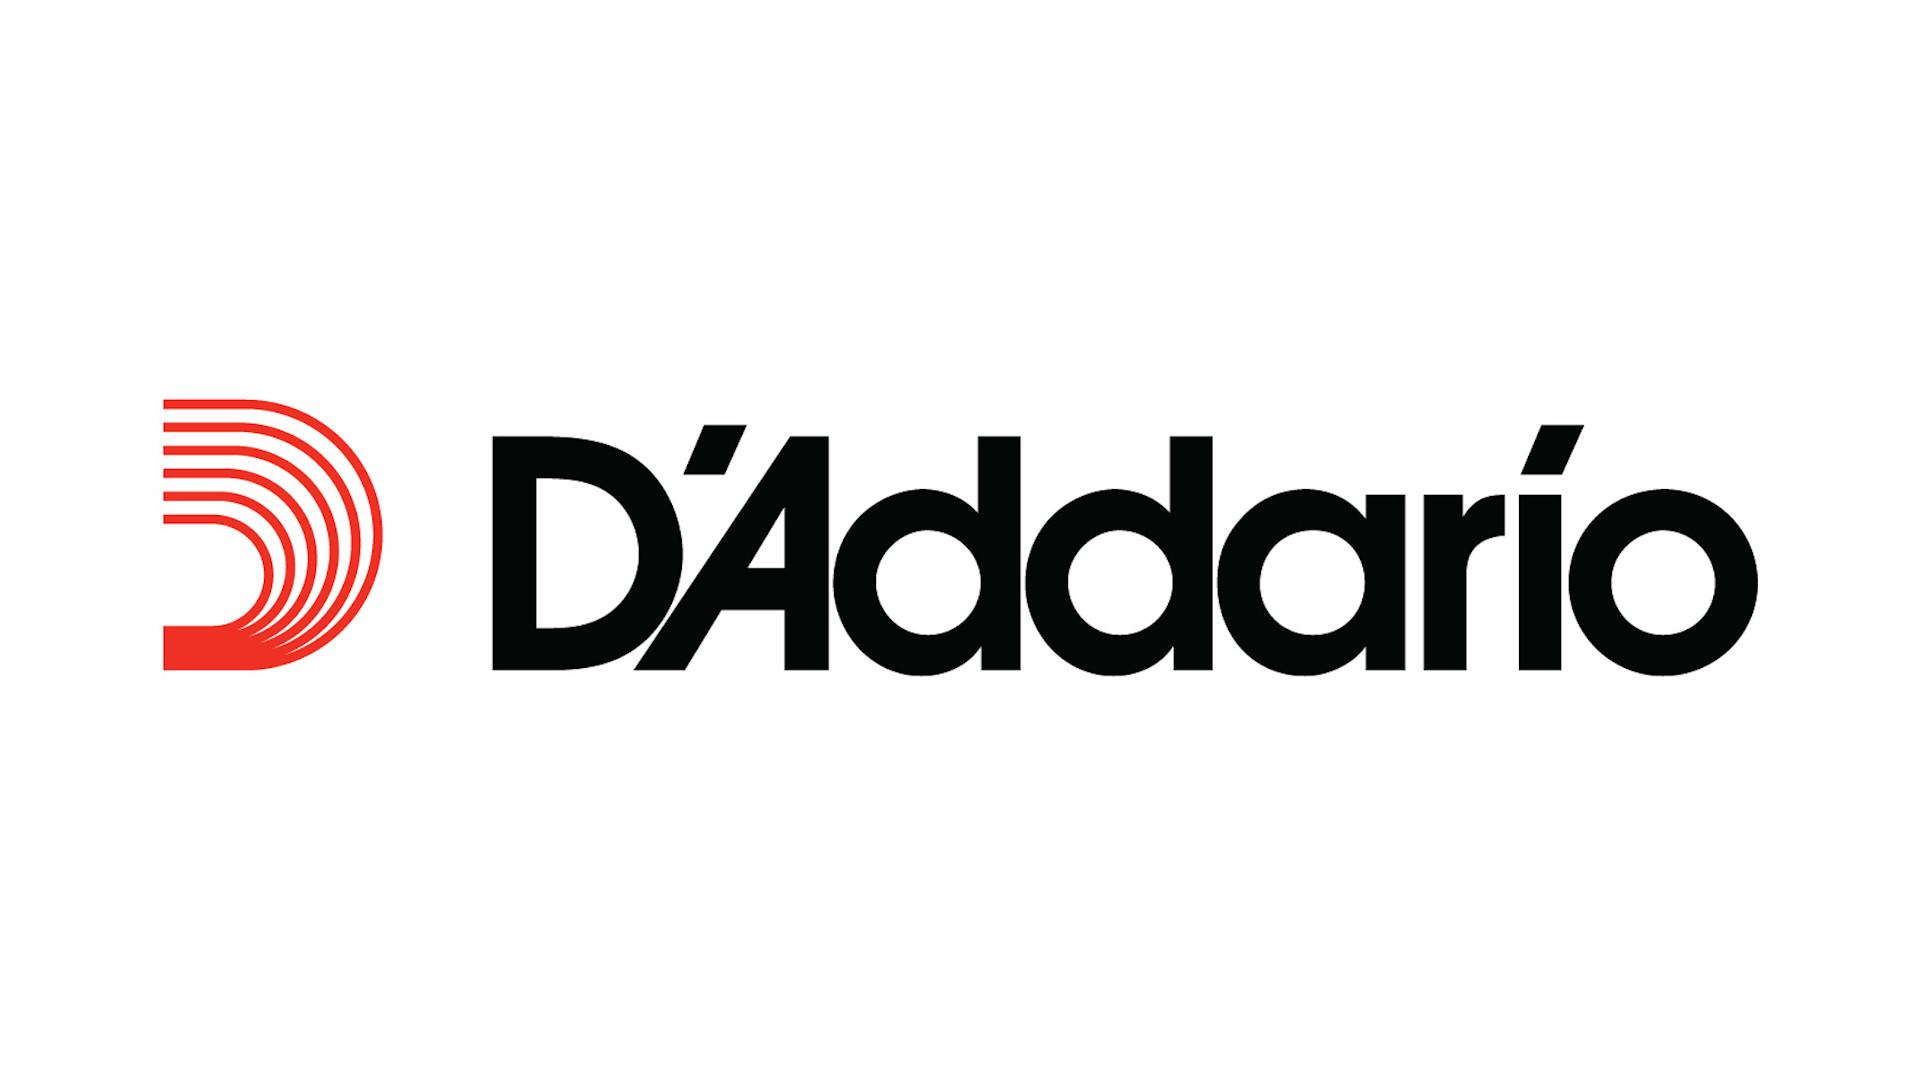 D'Addario Acquires Super-Sensitive Musical String Company